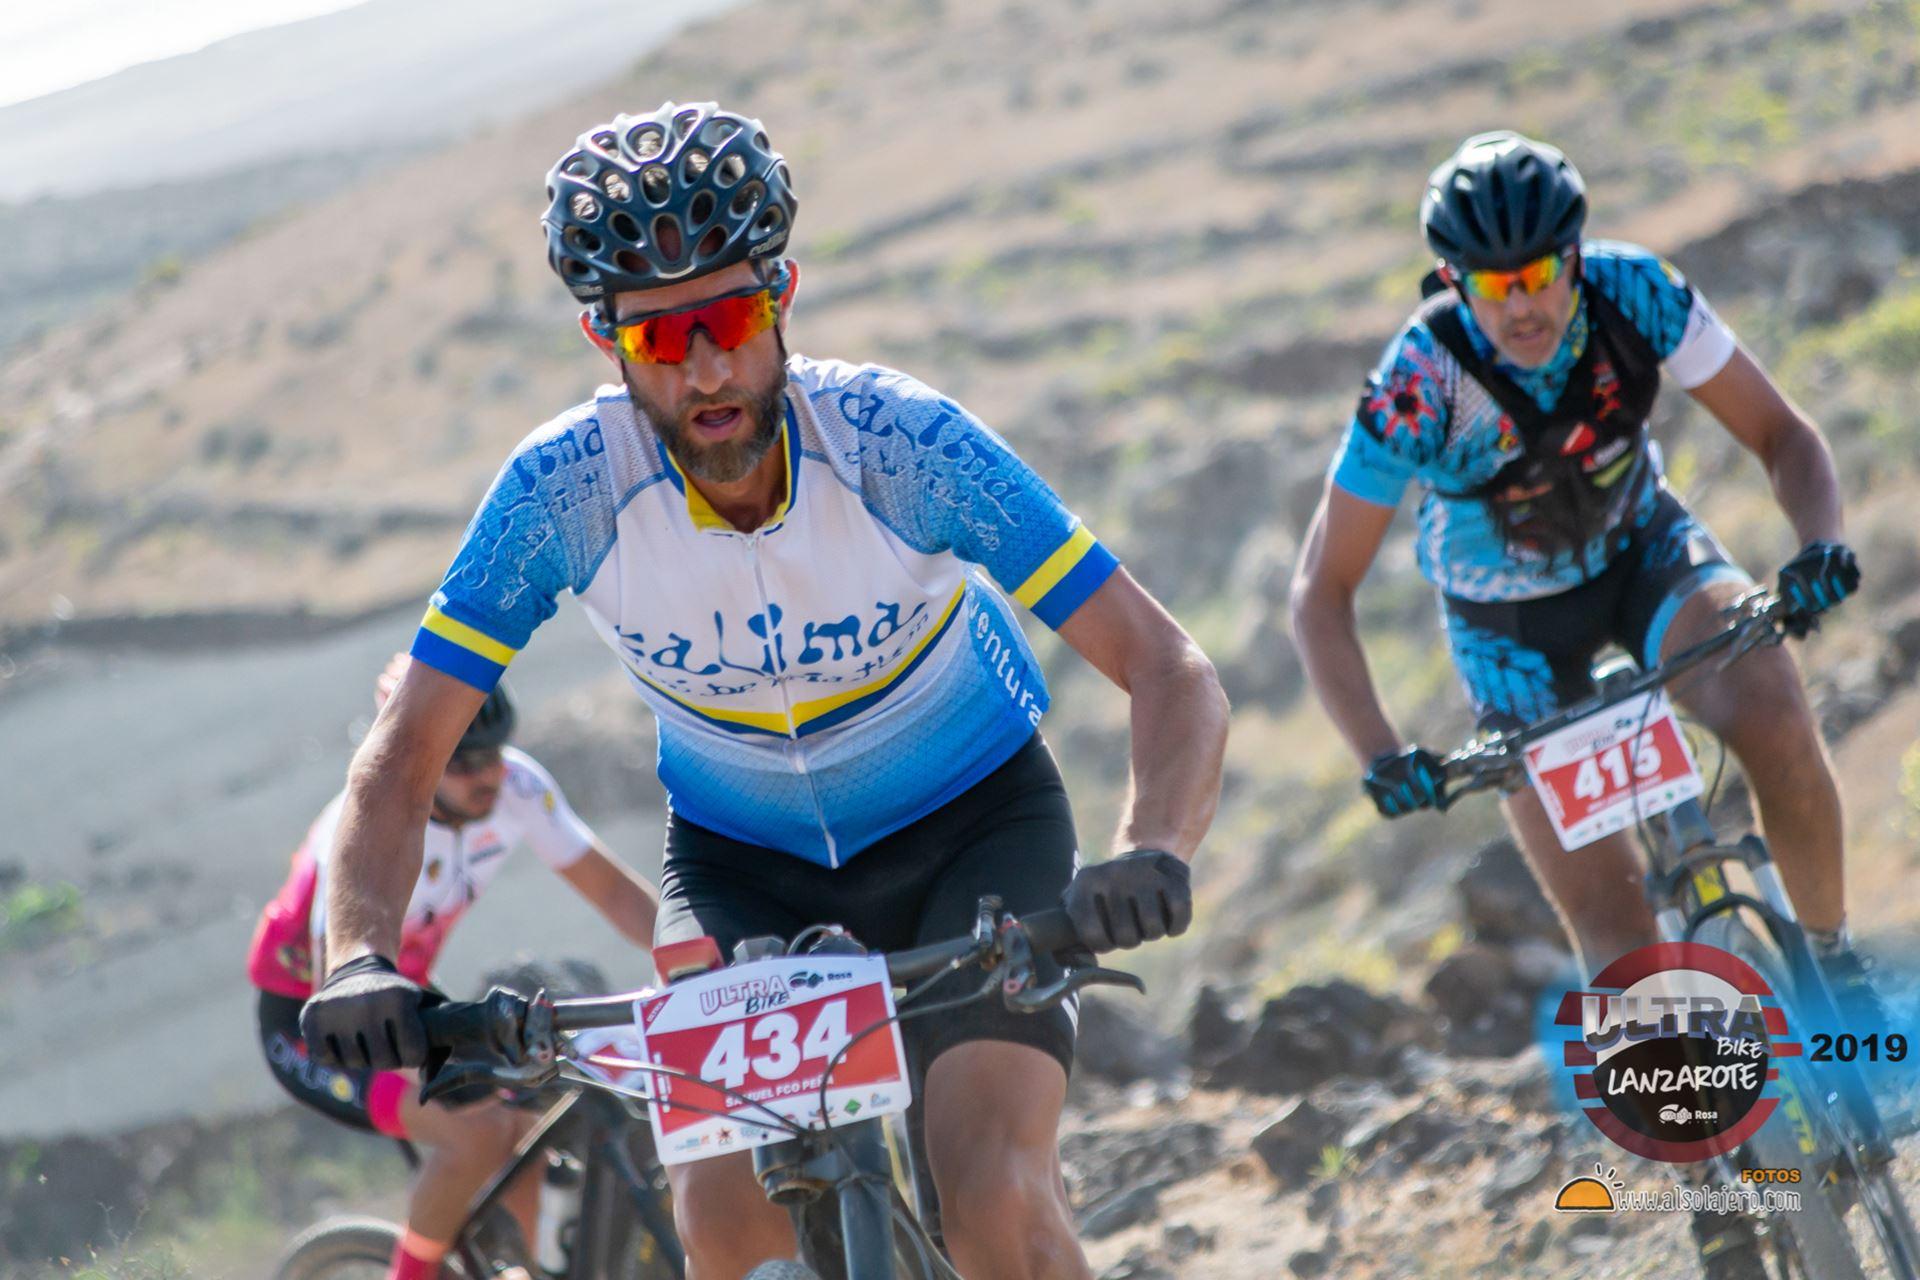 Sector Rofera 2ª Etapa Ultrabike 2019 Fotos Alsolajero.com-65